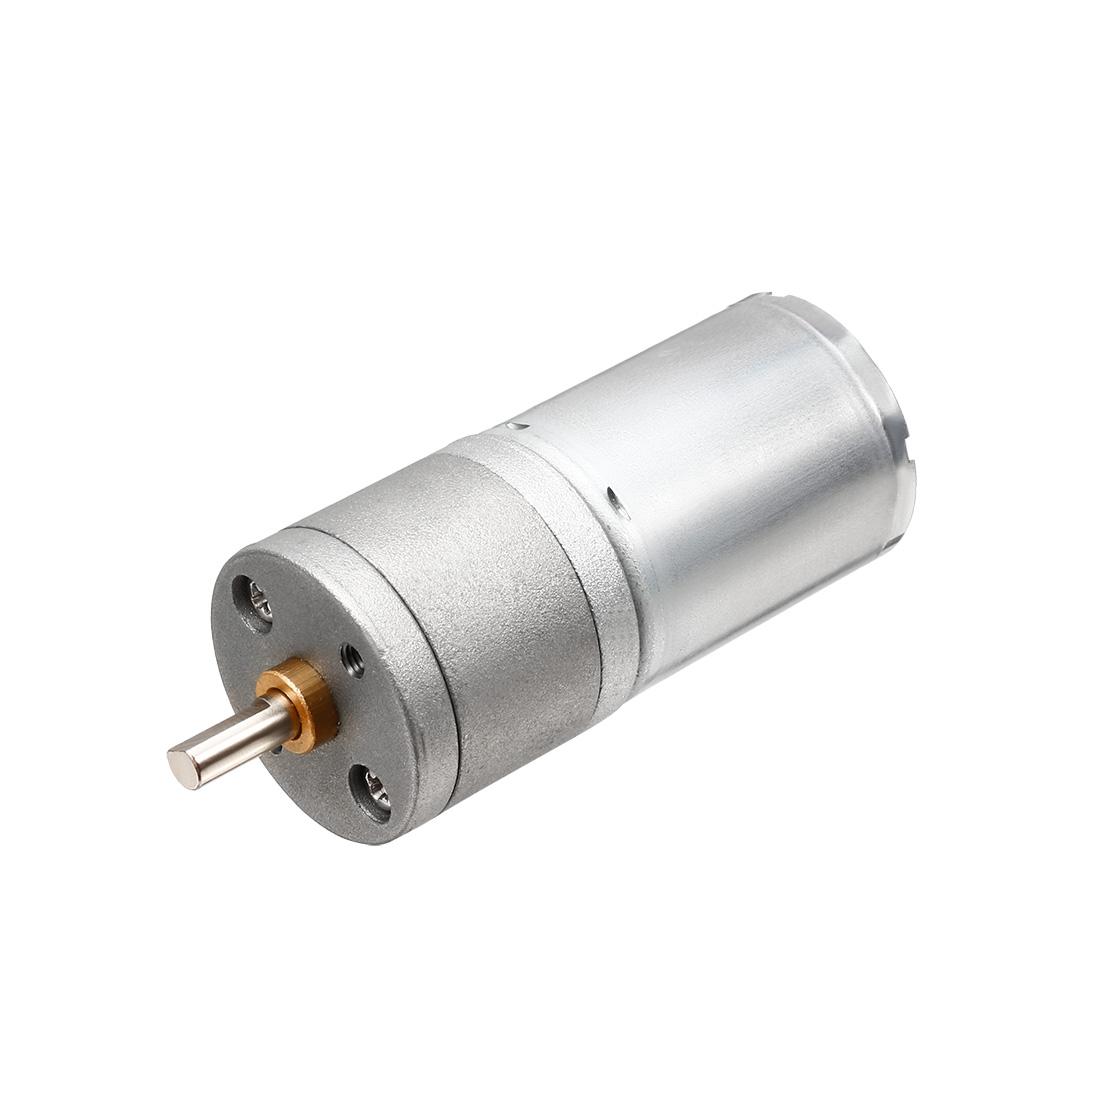 DC 12V 50 RPM 4mm Dia D Shape Shaft Speed Reduce Geared Box Motor JGA25-370